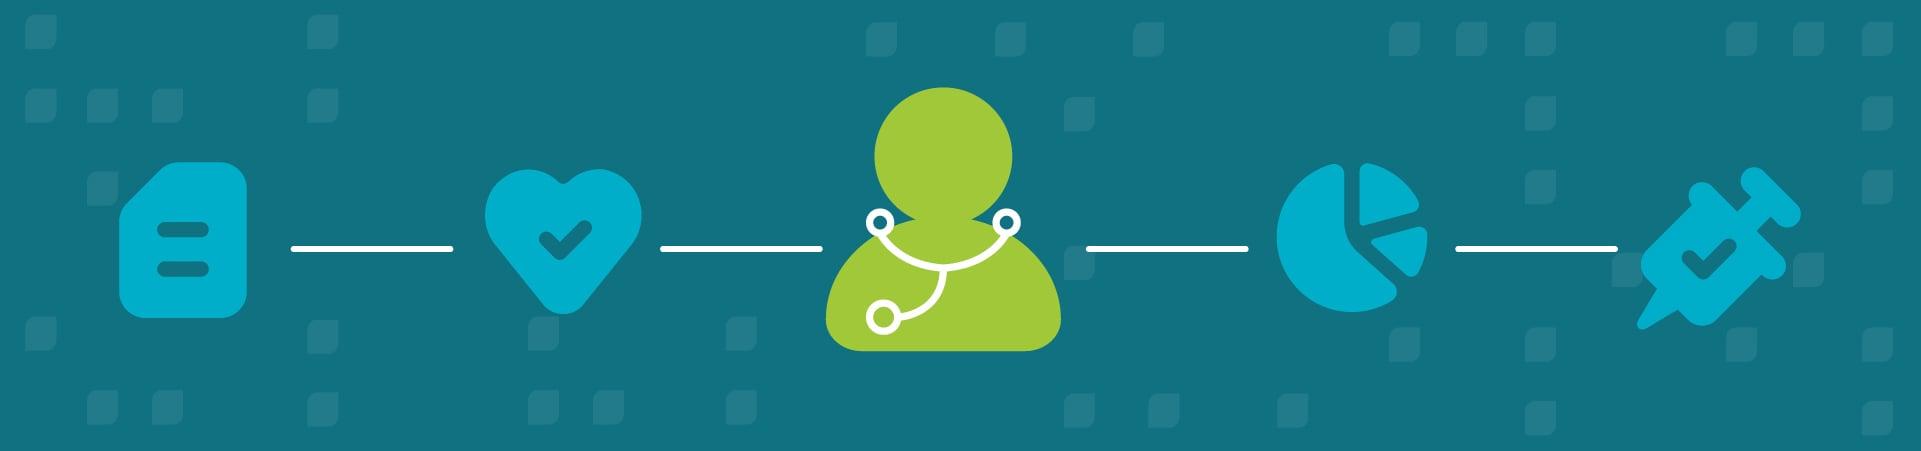 provider-link-shot-test-chart-apc